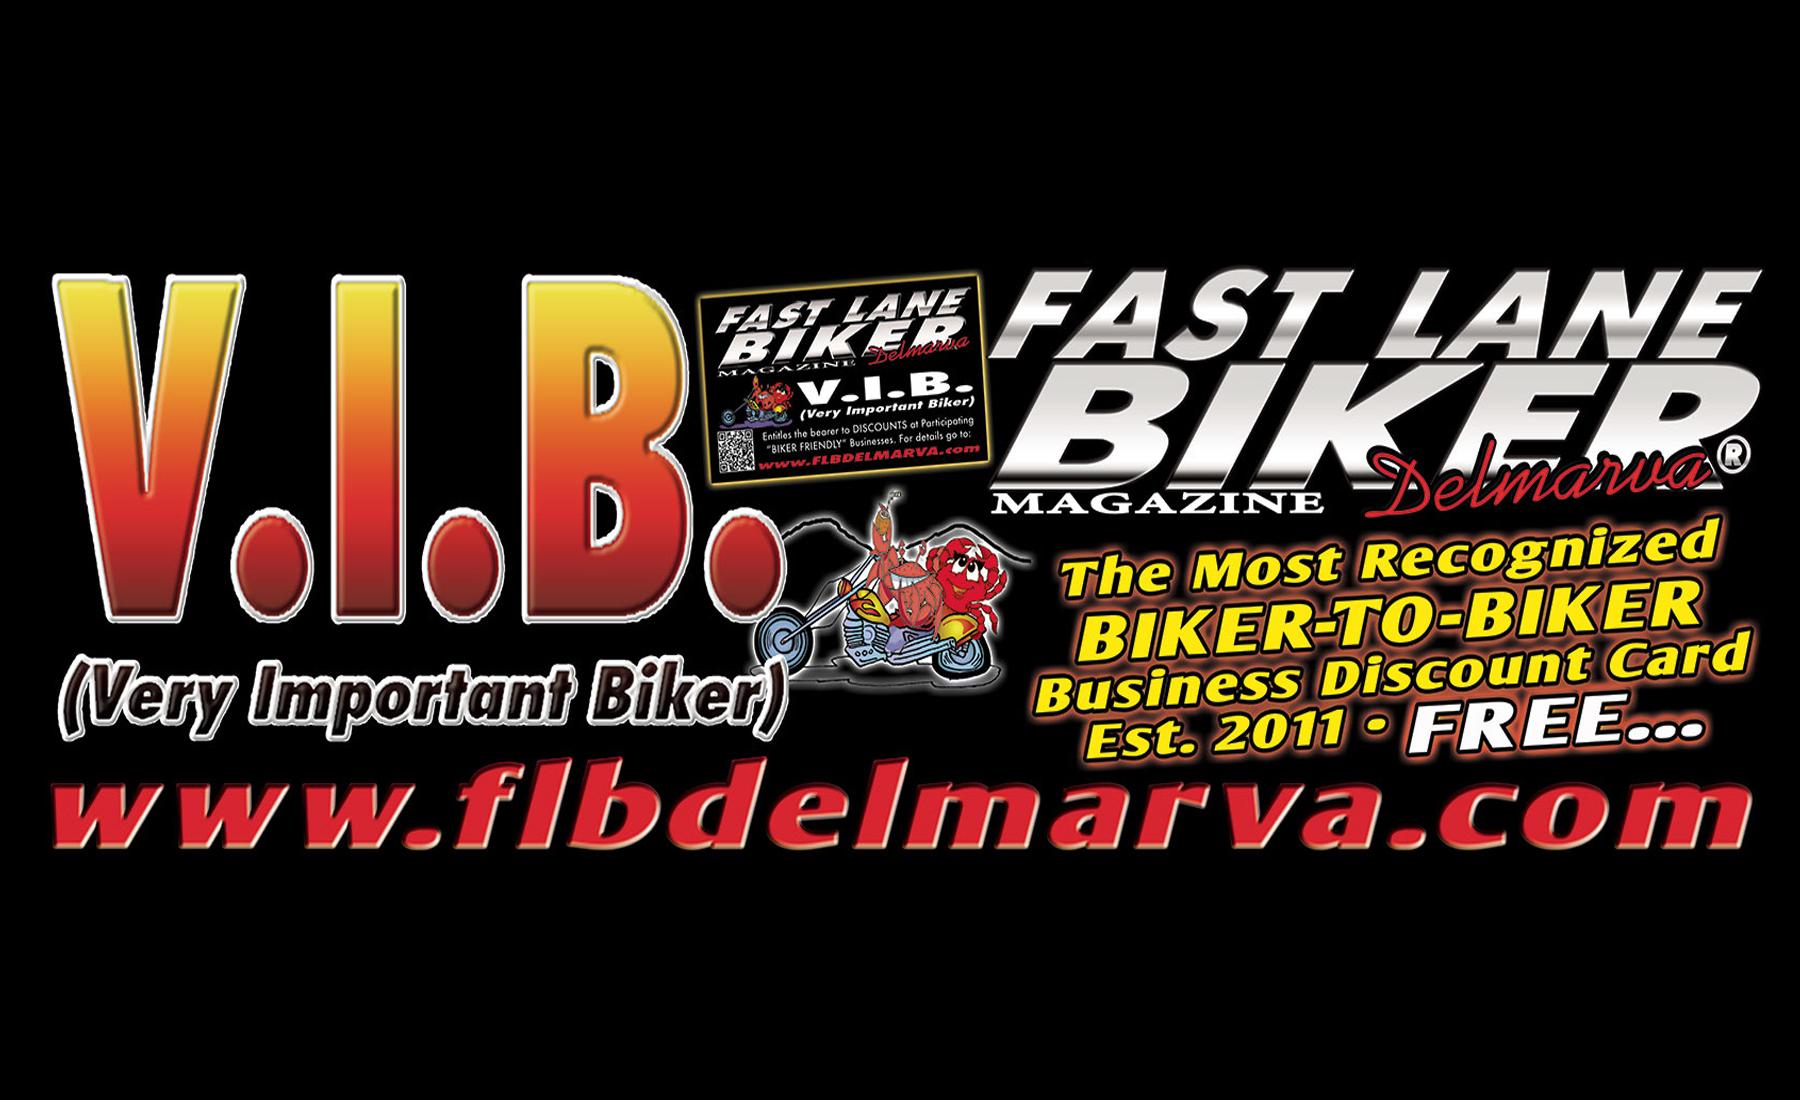 http://fastlanebikerdelmarva.com/wp/wp-content/uploads/2016/03/VIB-Banner1.jpg